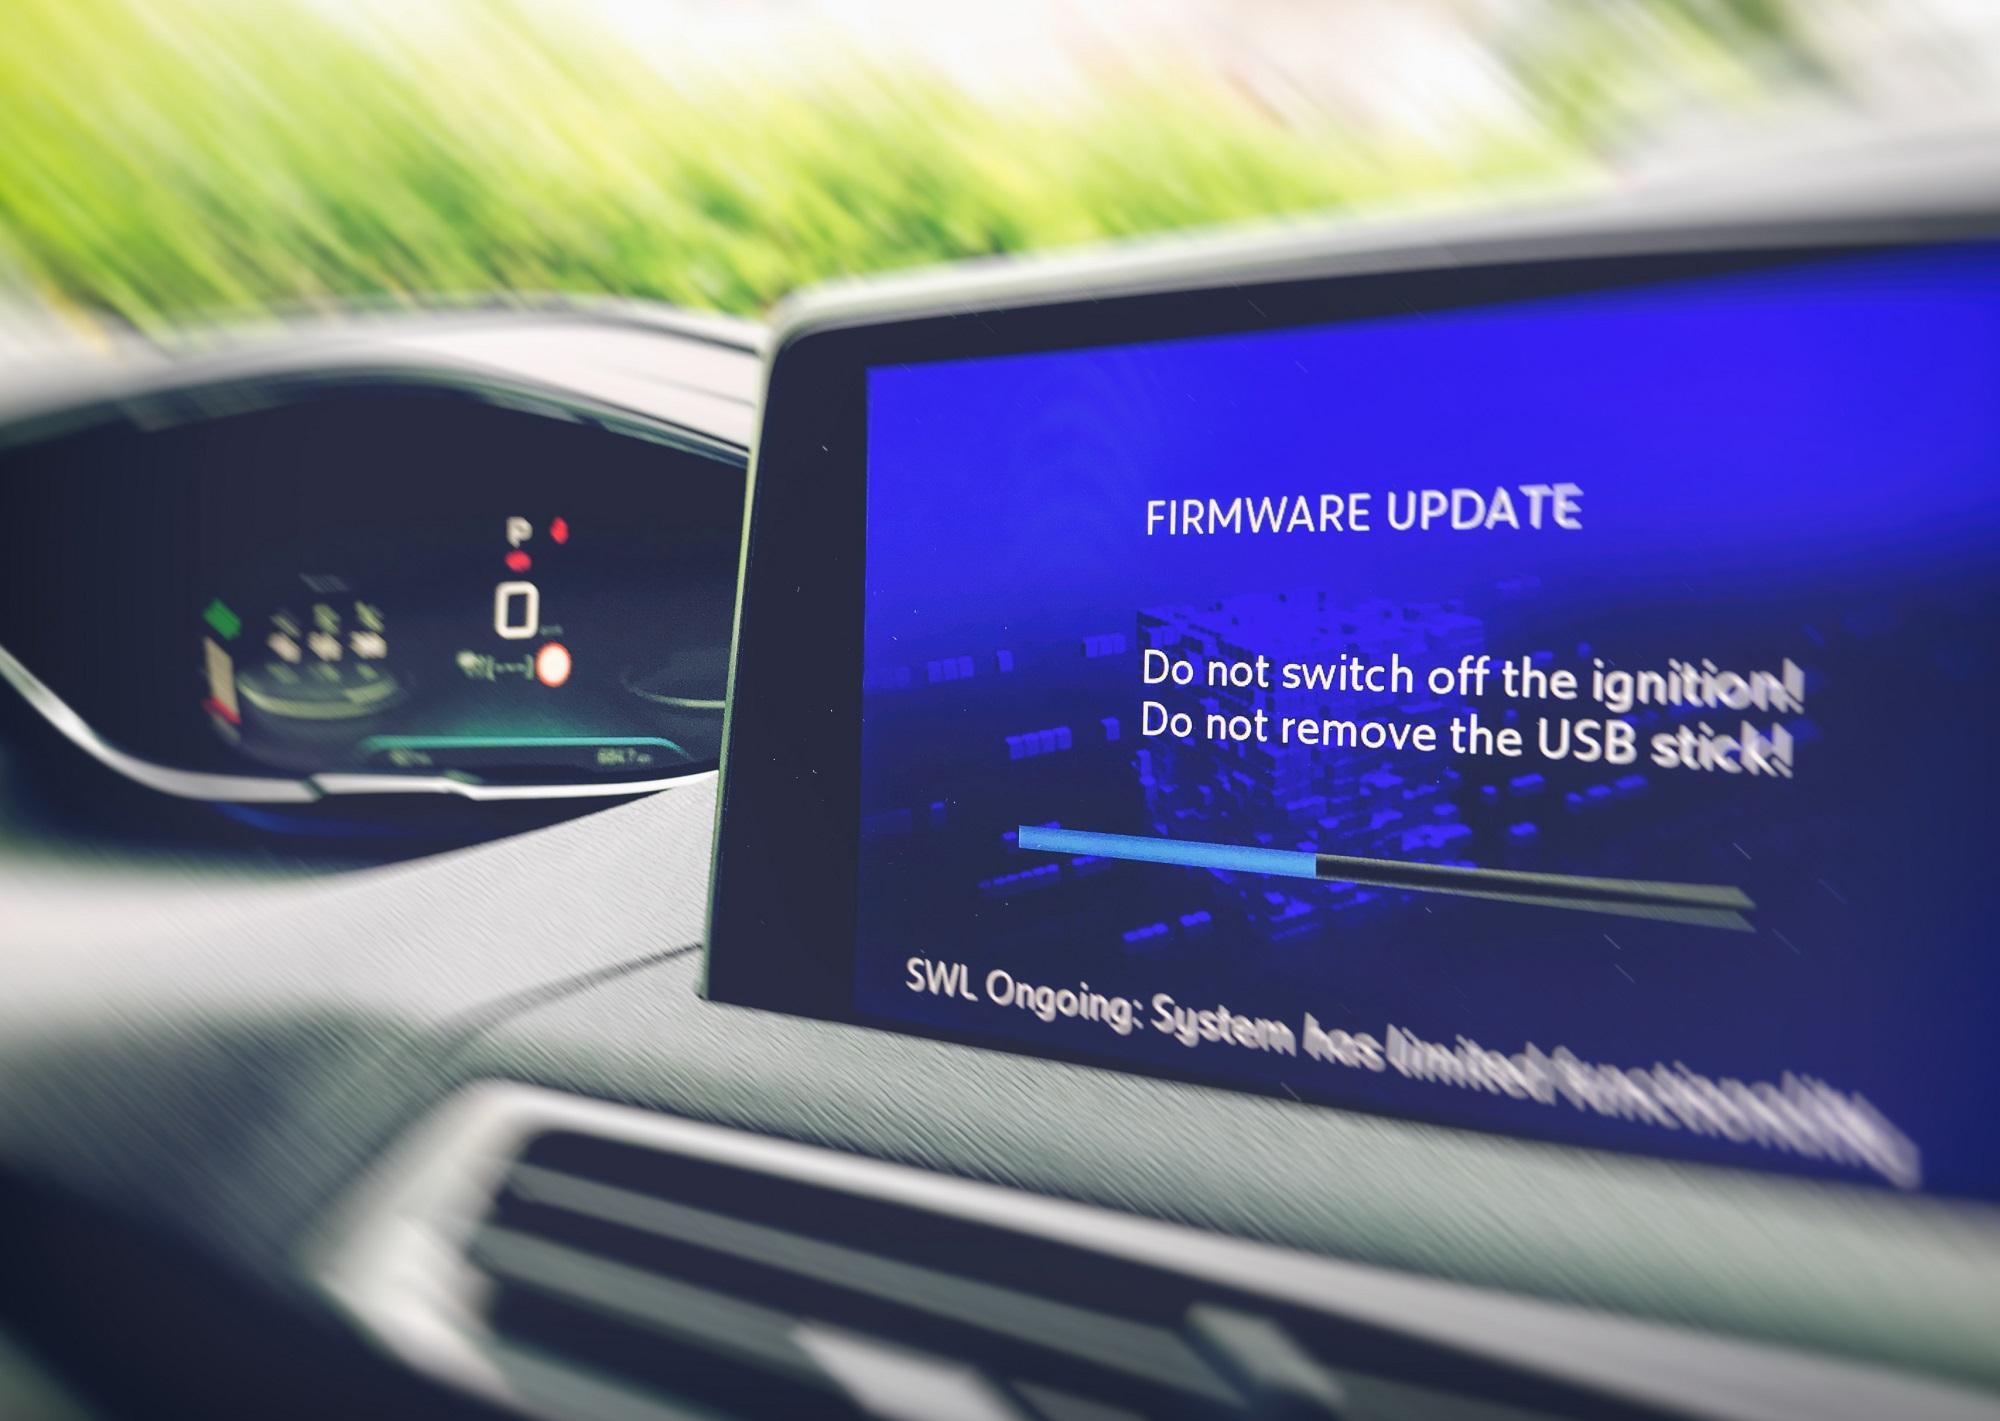 Frimware update